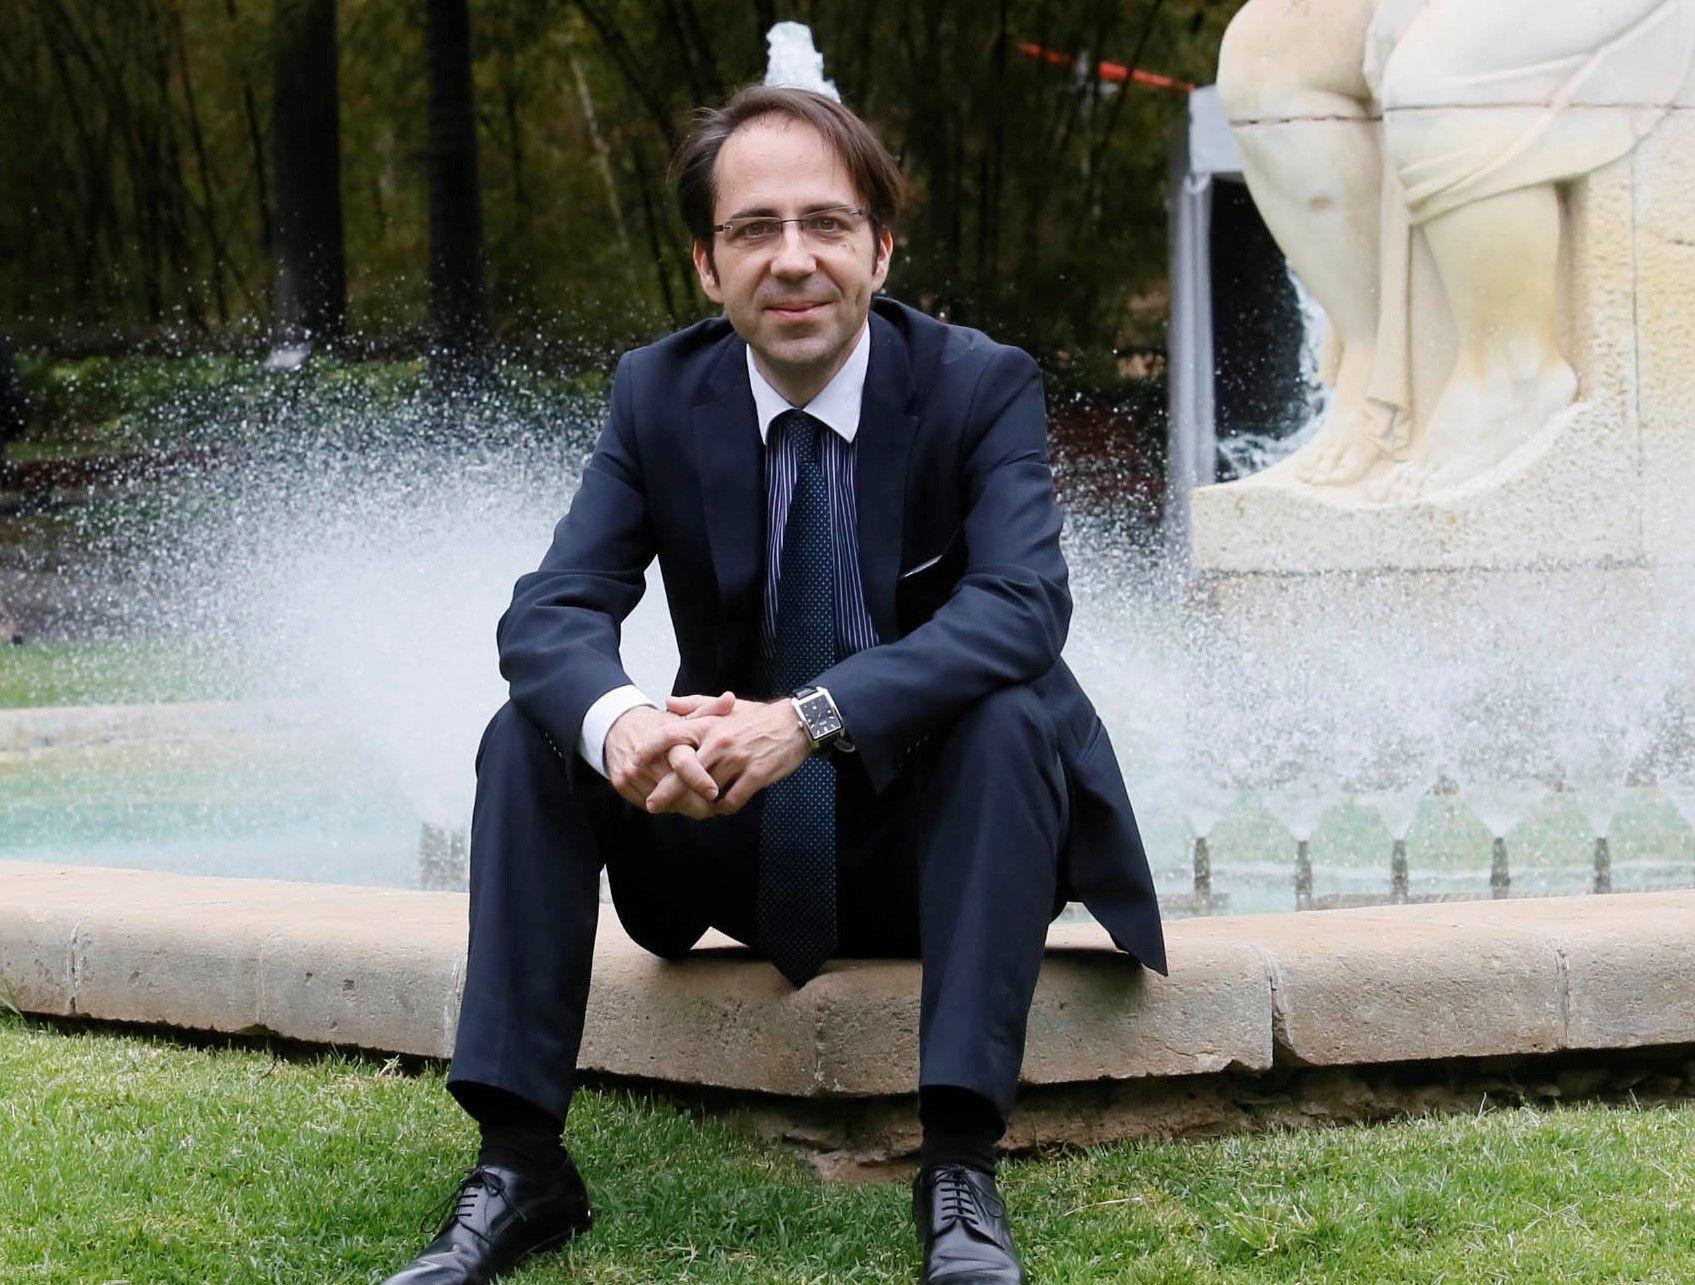 Dr. D. Gerardo Pérez Sánchez